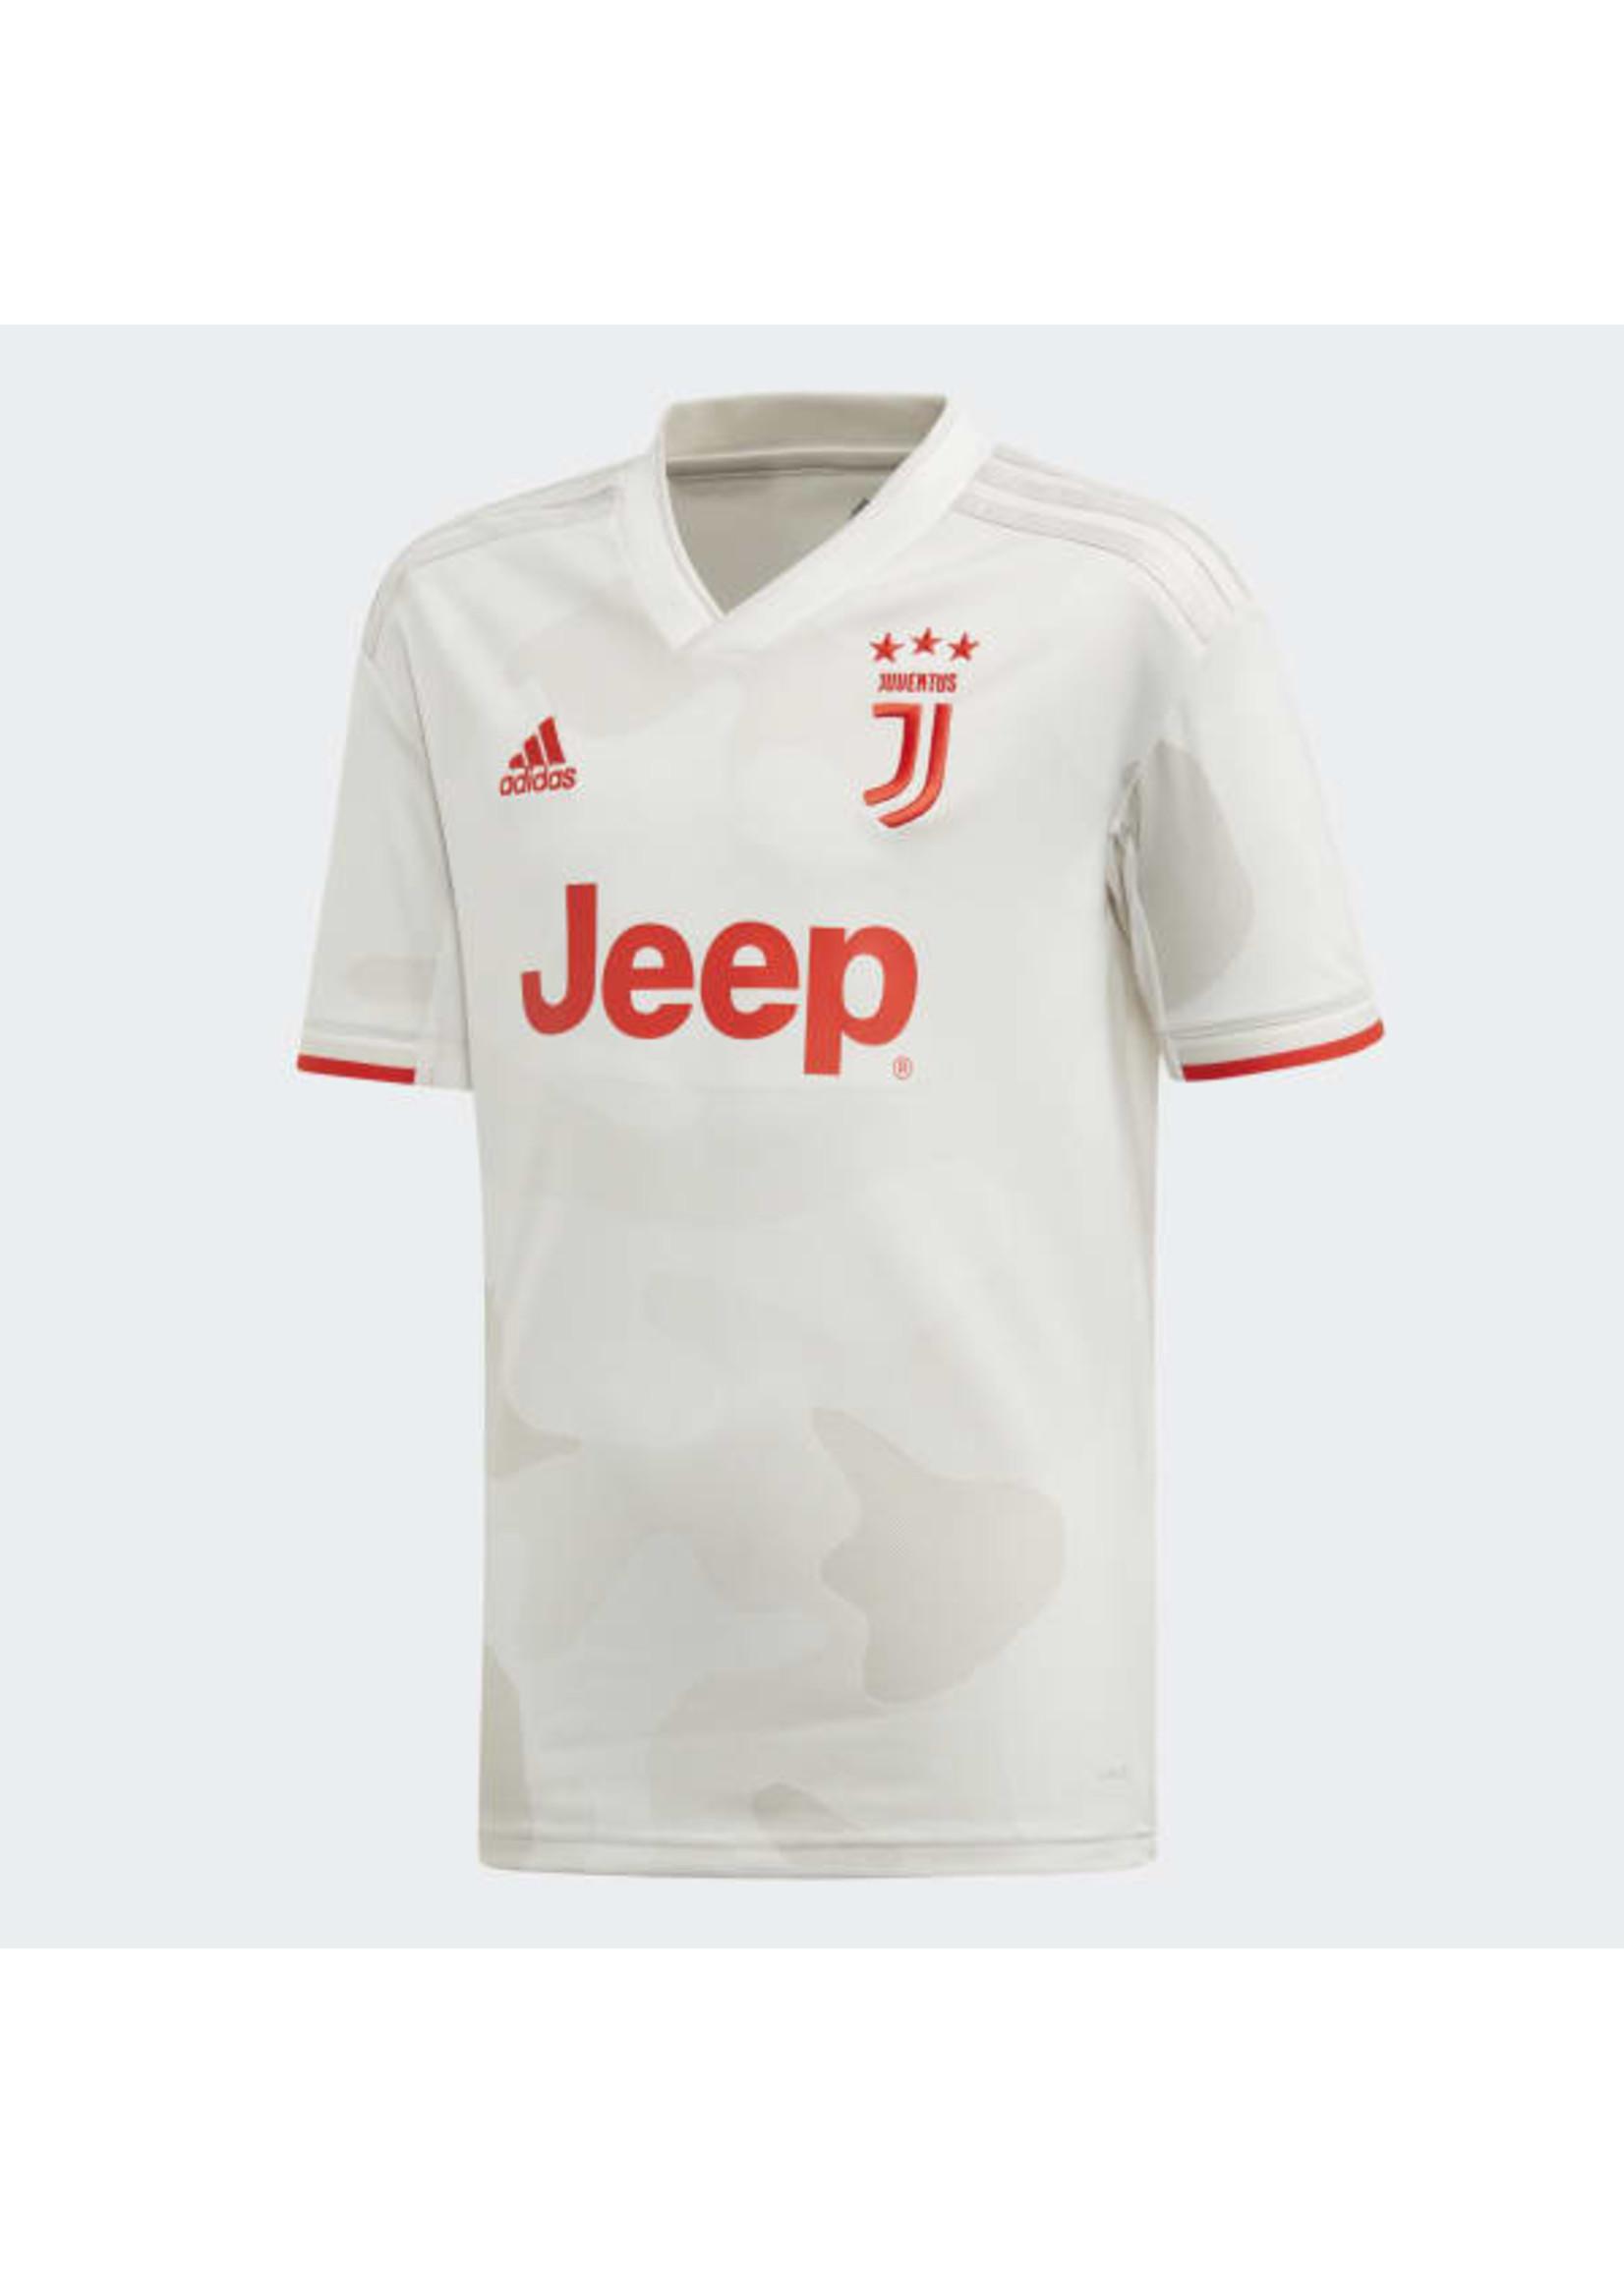 Adidas Juventus 19/20 Away Jersey Youth XL